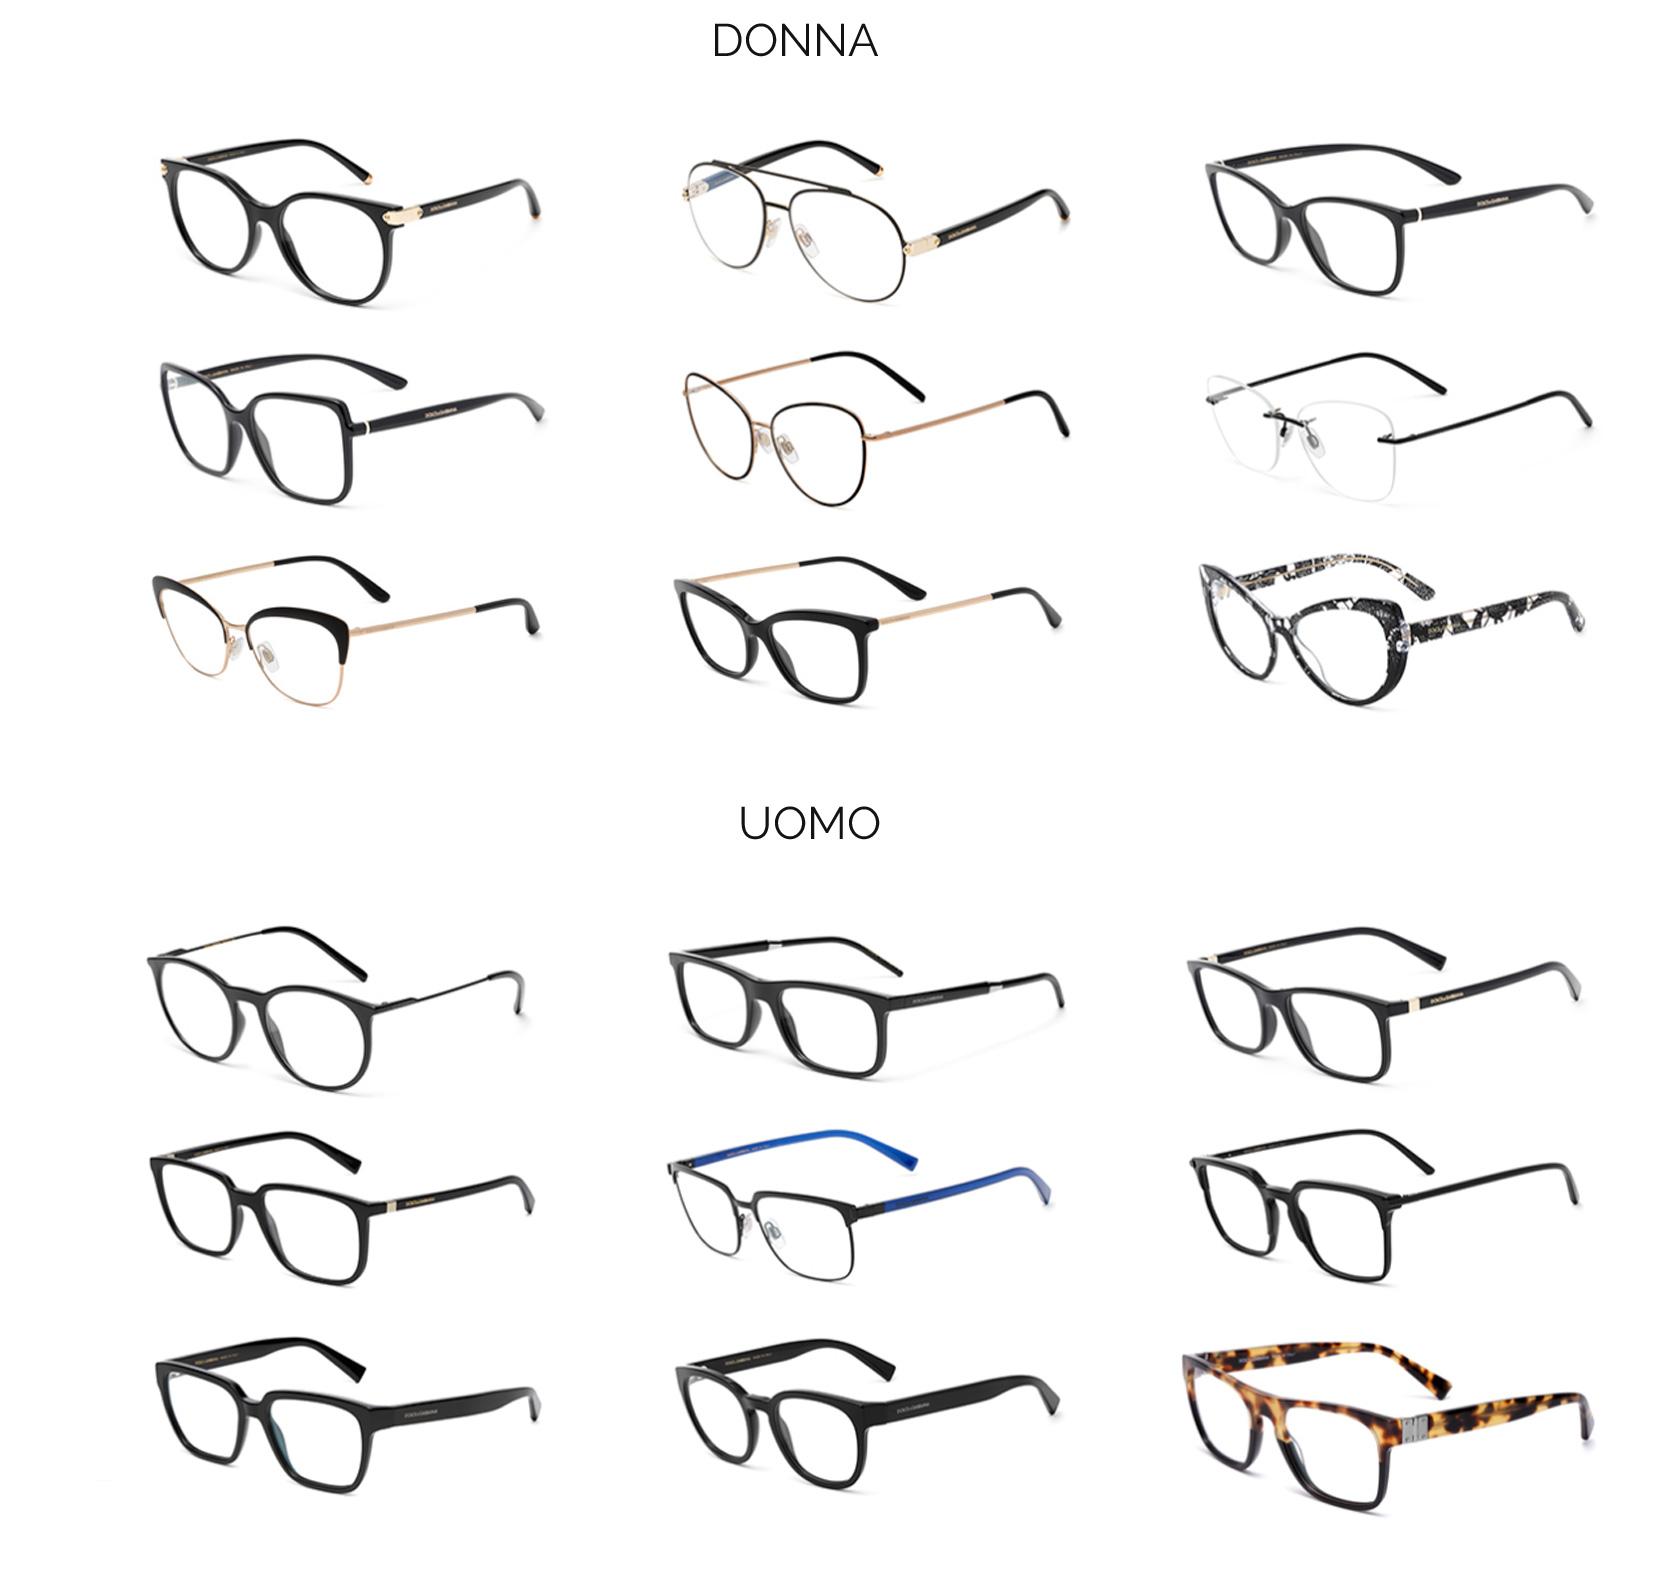 occhiali-da-vista-dolce-e-gabbana-a-prato